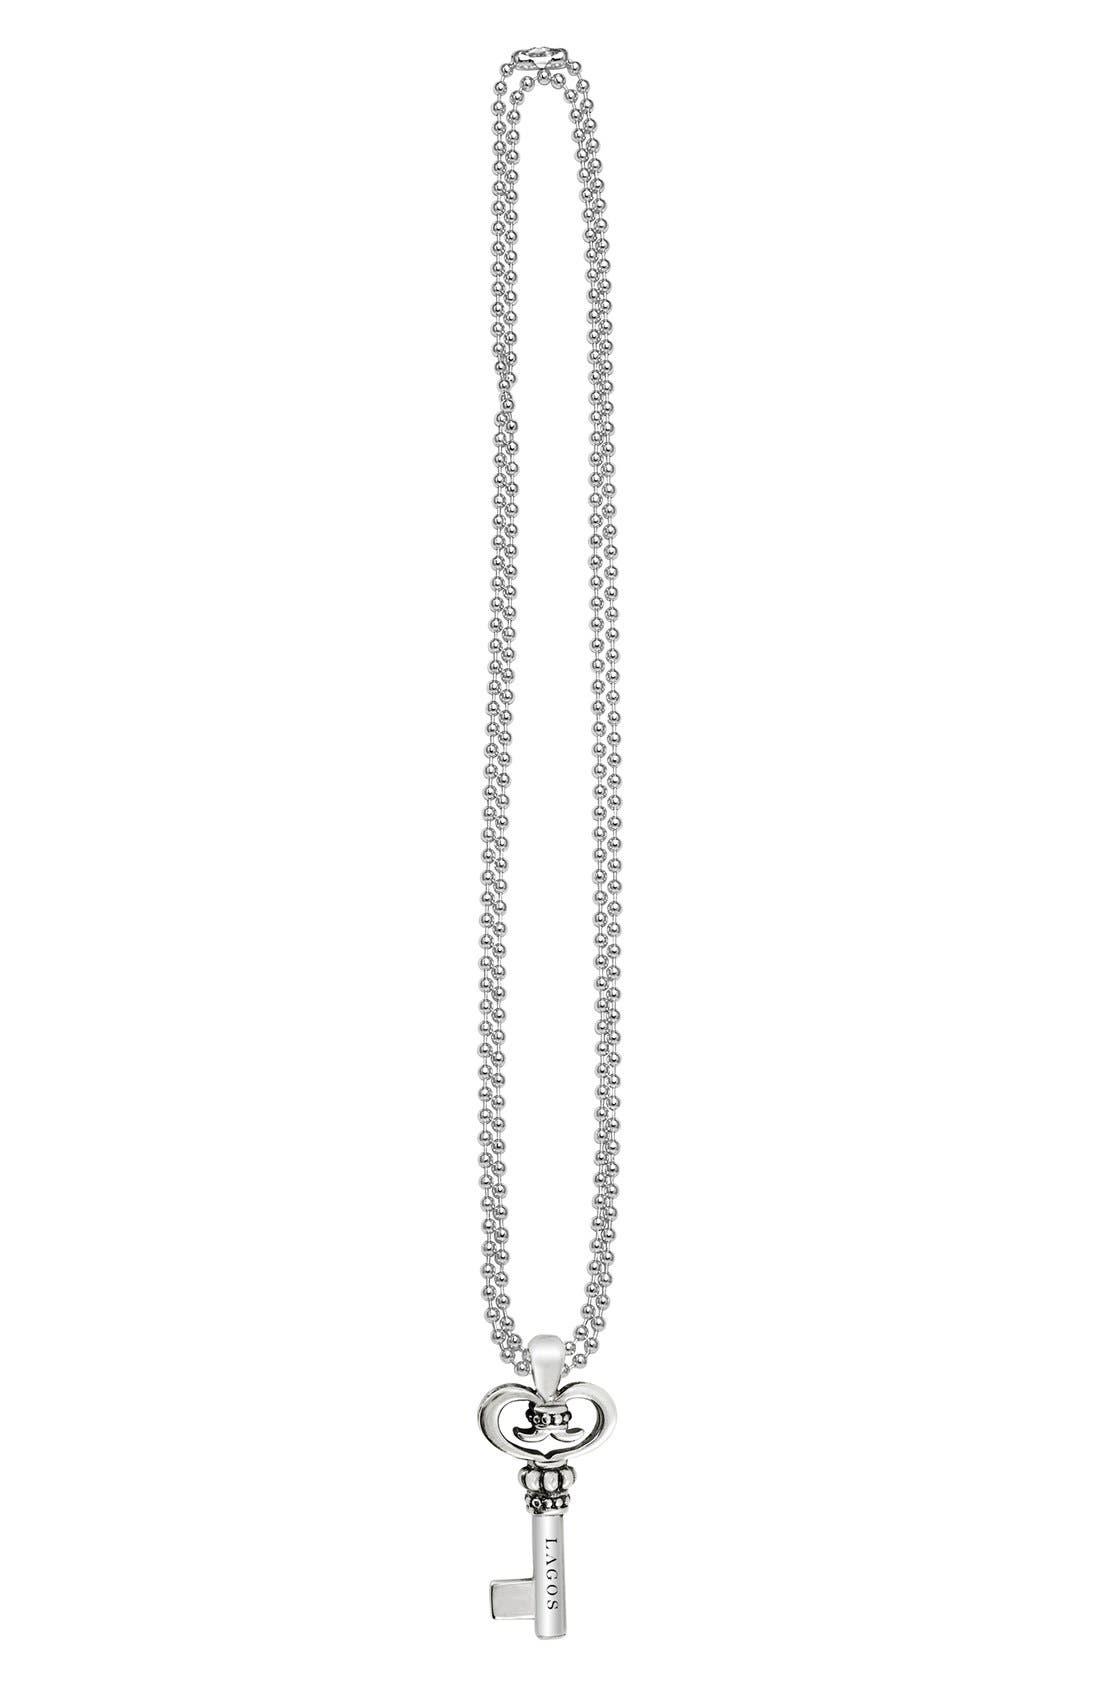 Sterling Silver Key Long Strand Pendant Necklace,                             Alternate thumbnail 7, color,                             KEY